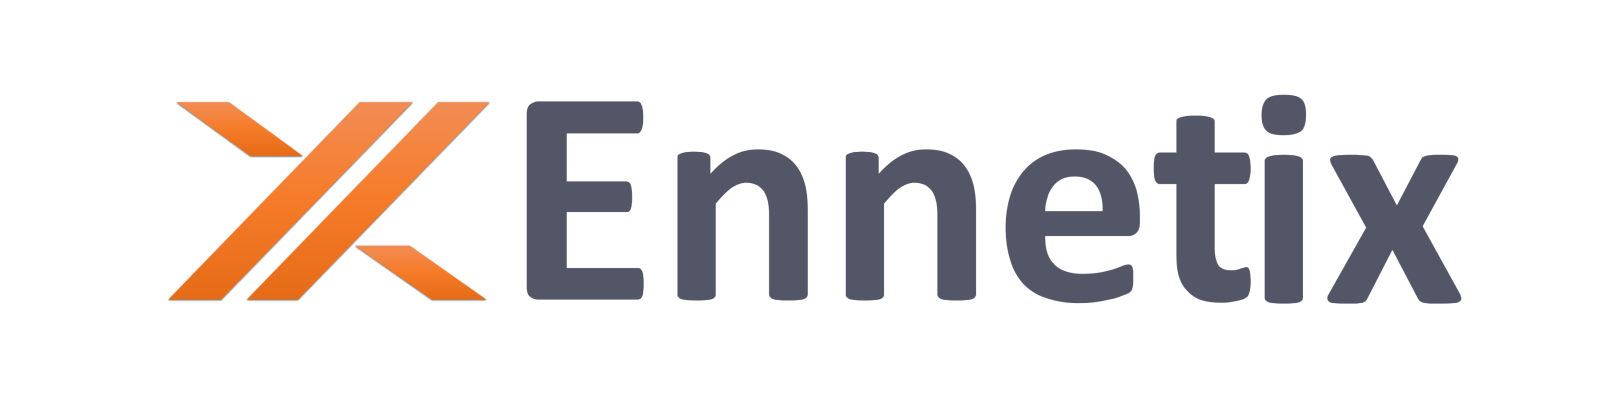 Ennetix